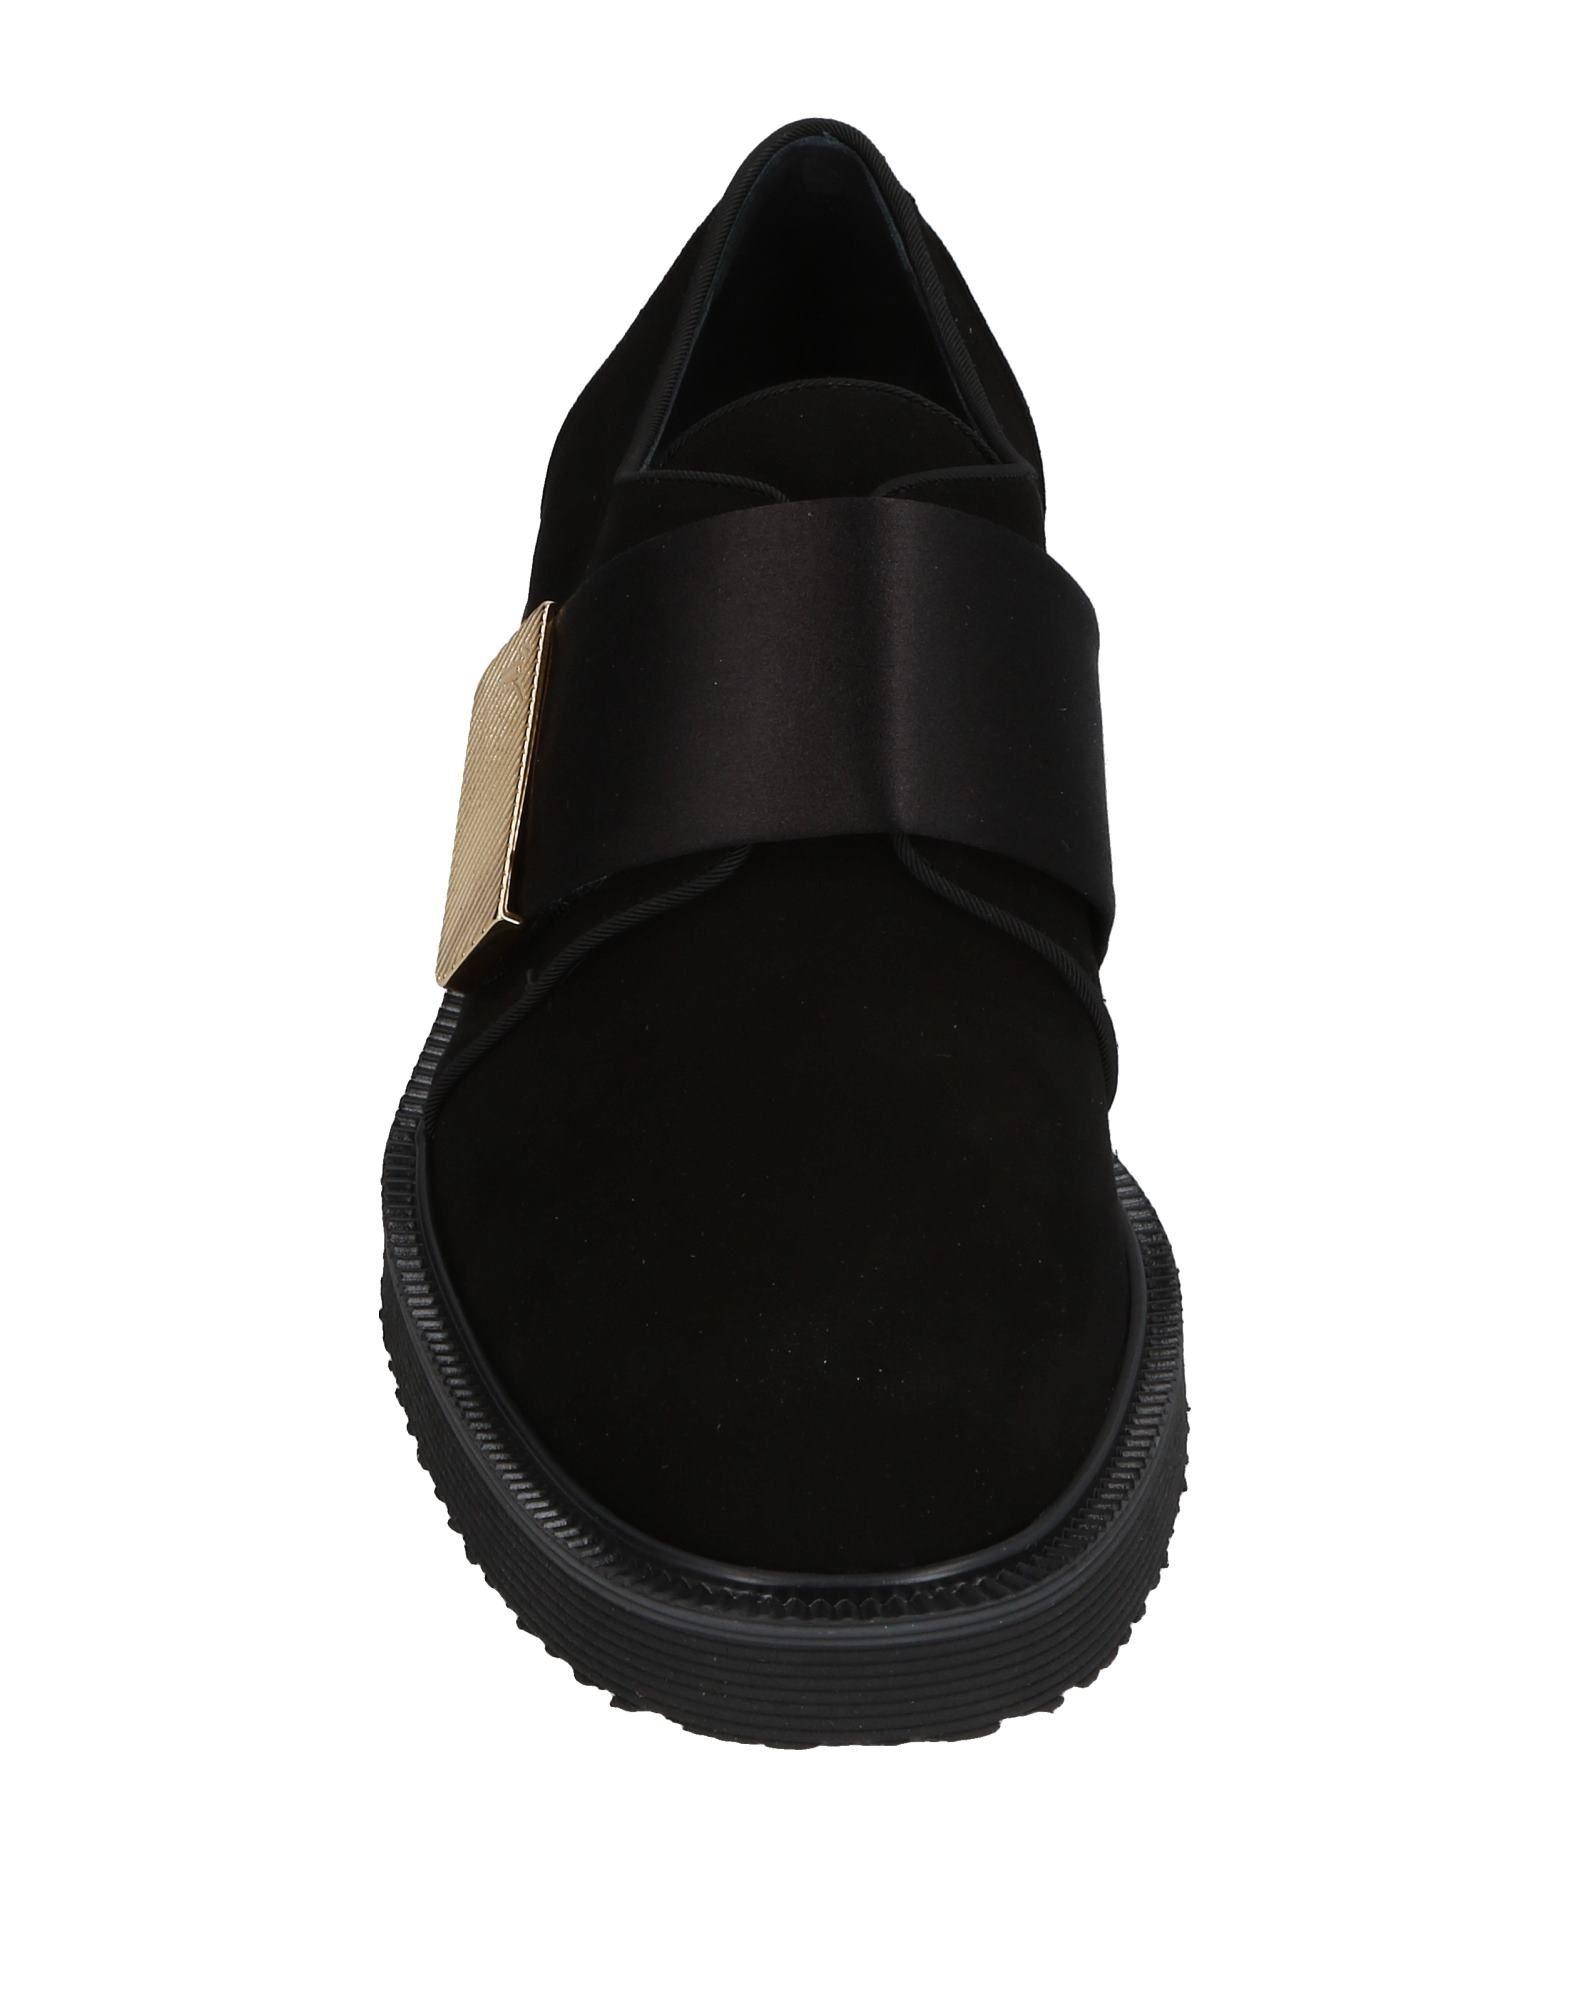 Giuseppe Zanotti Mokassins Schuhe Herren  11447655EH Neue Schuhe Mokassins c8af66